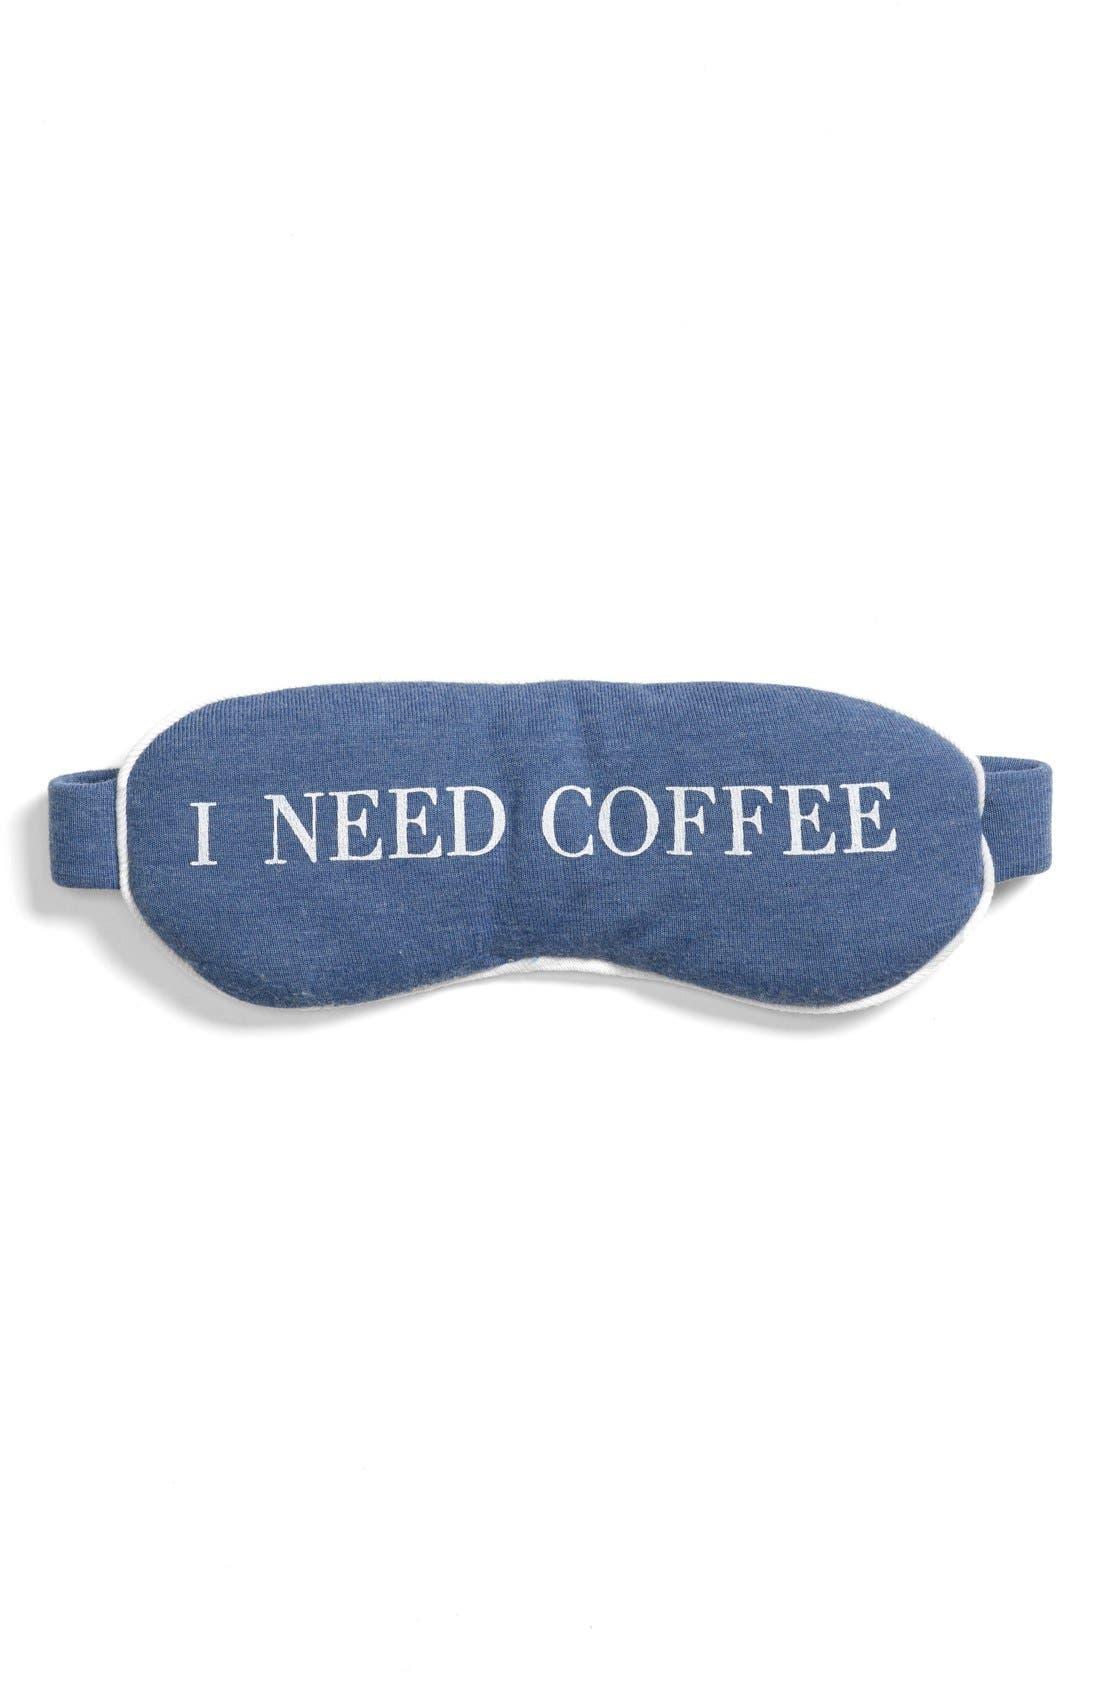 Alternate Image 1 Selected - Wildfox 'I Need Coffee' Sleep Mask